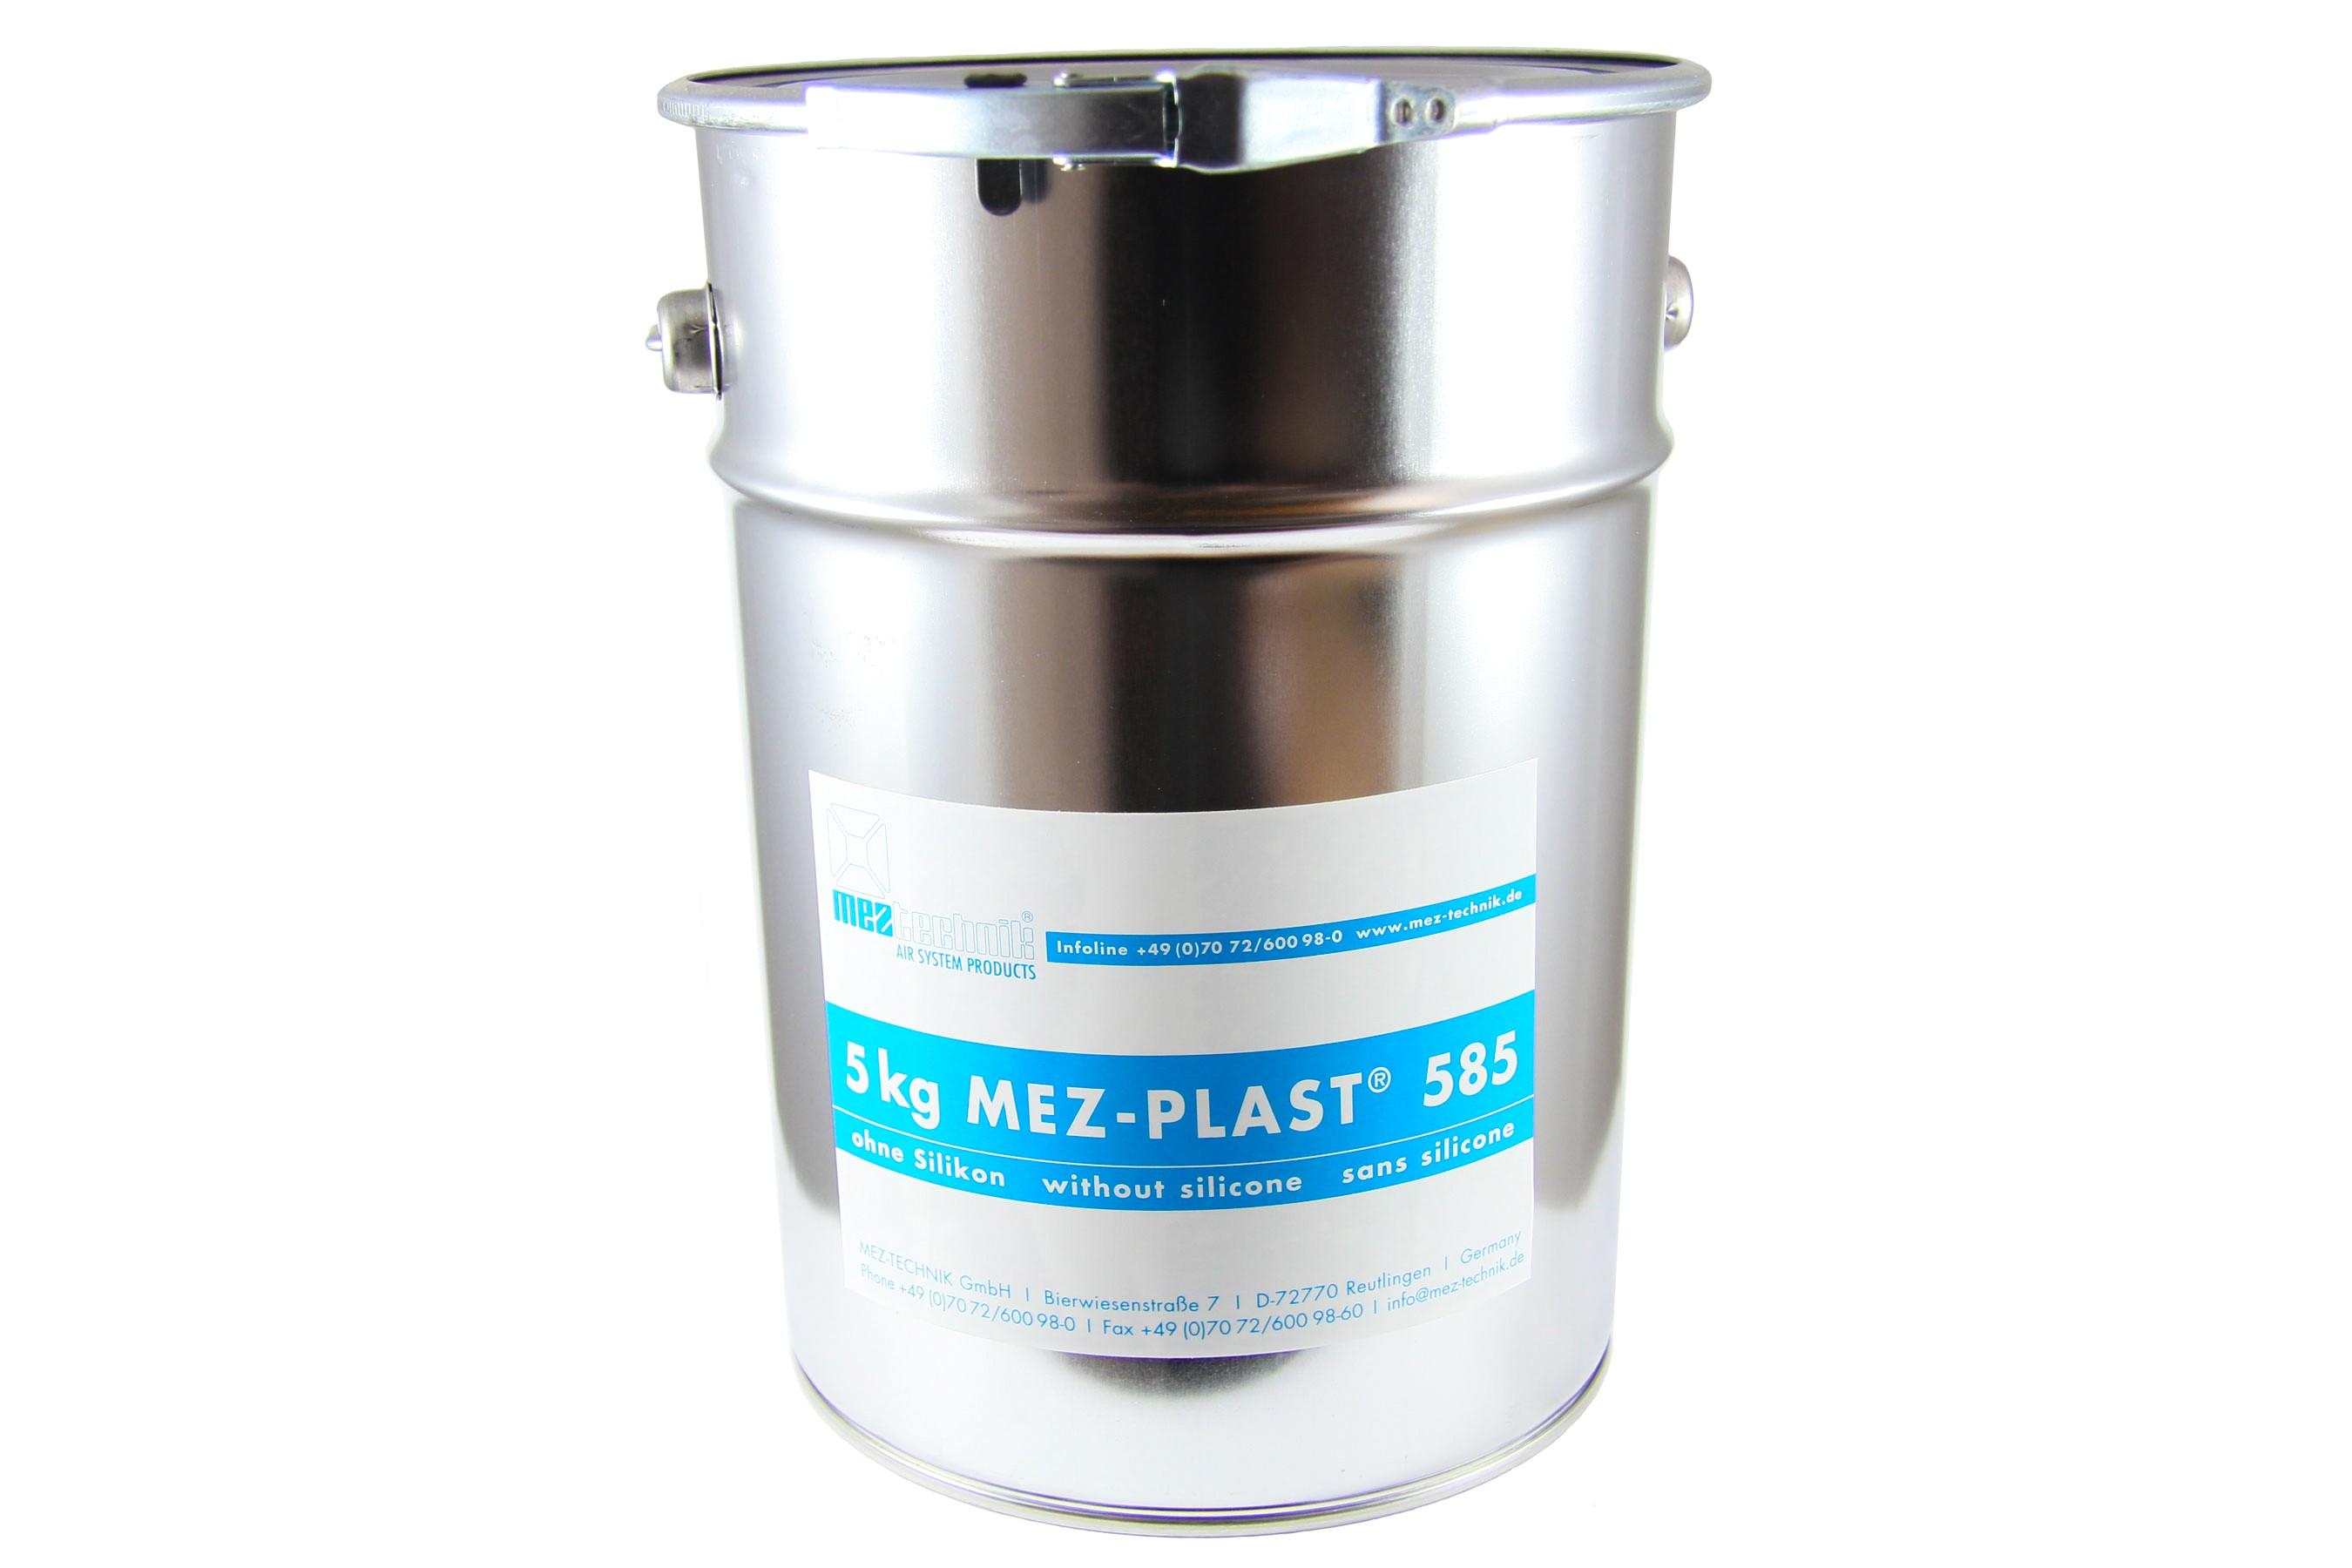 MEZ-PLAST 580 - 5 kg bucket